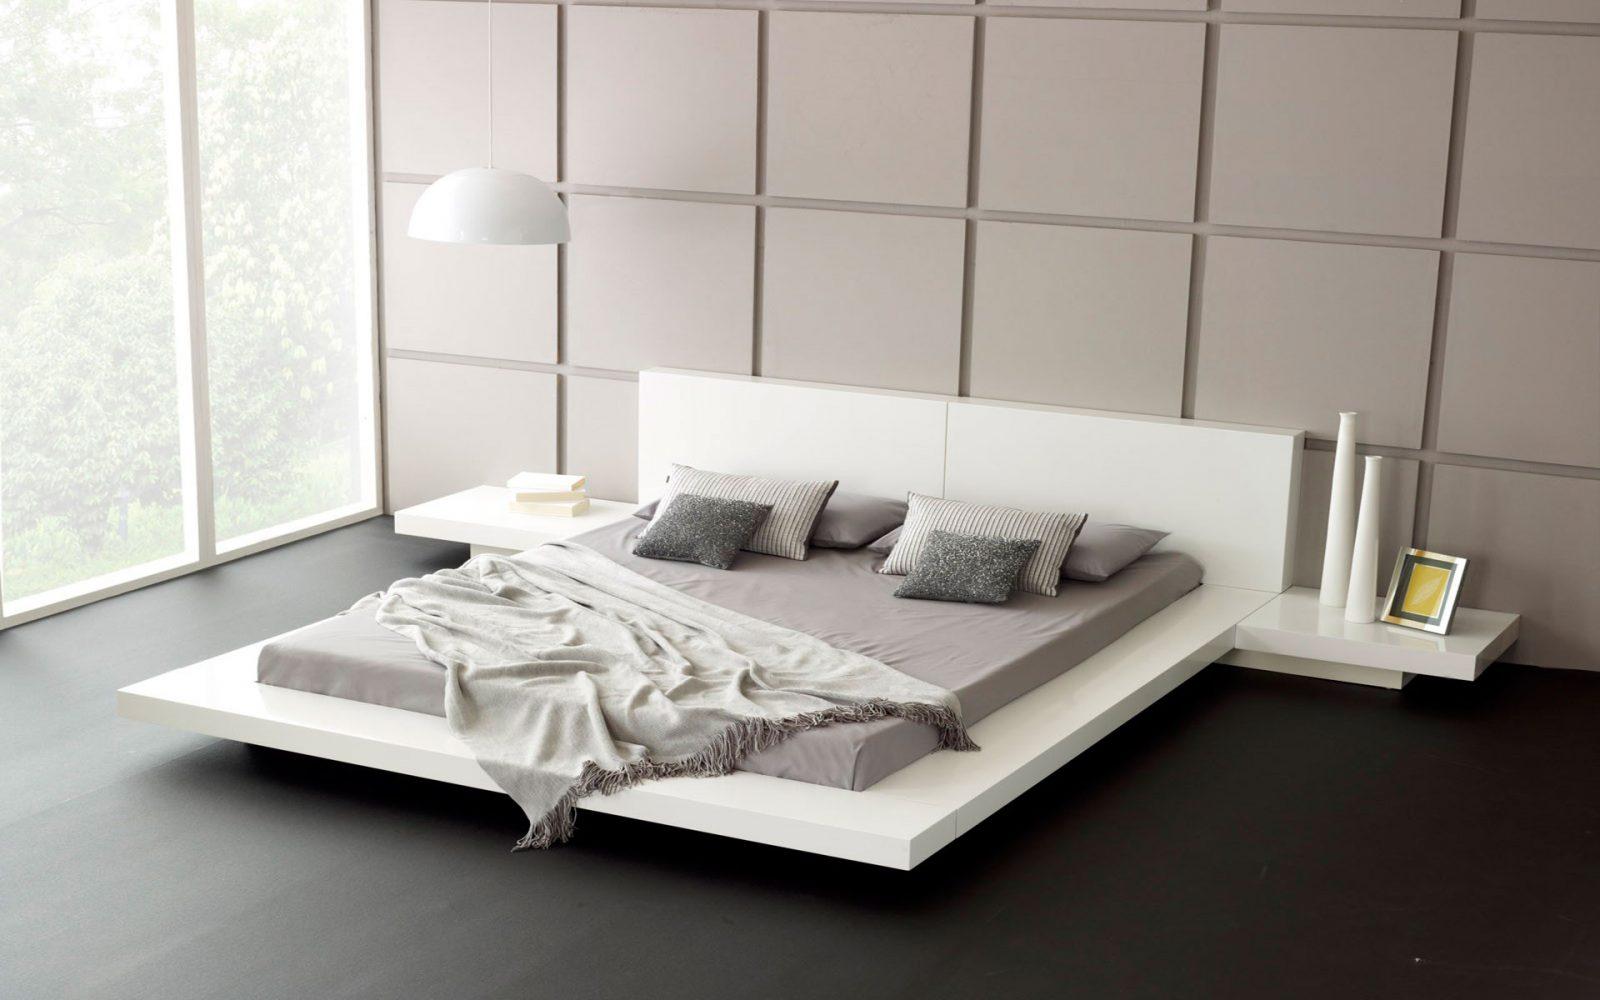 cama de matrimonio para una habitacin moderna - Habitacion Matrimonio Moderna